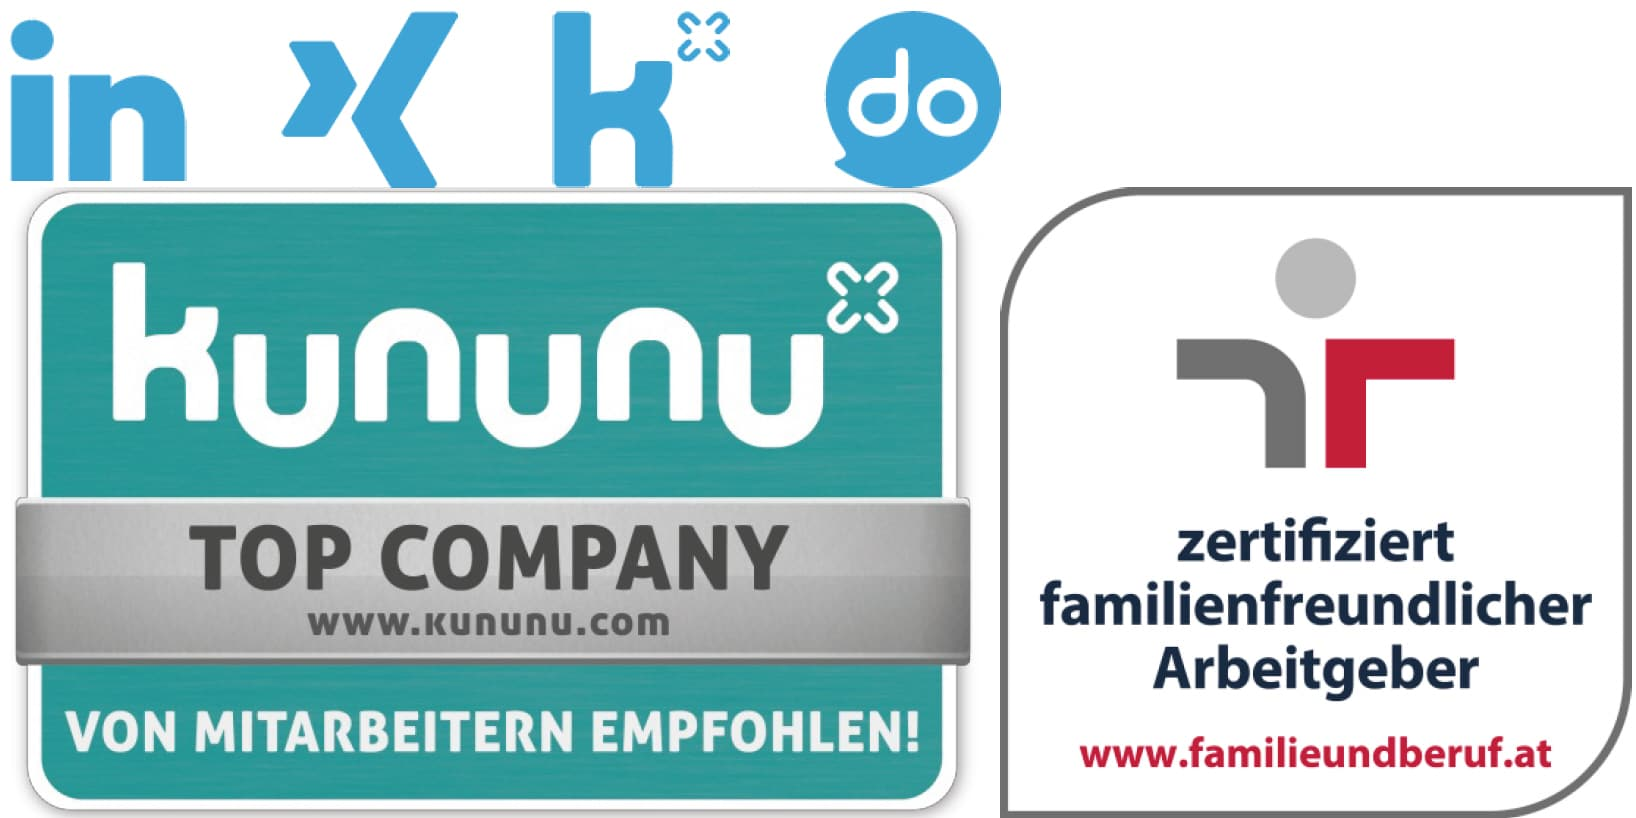 Erste-Bank-social-media